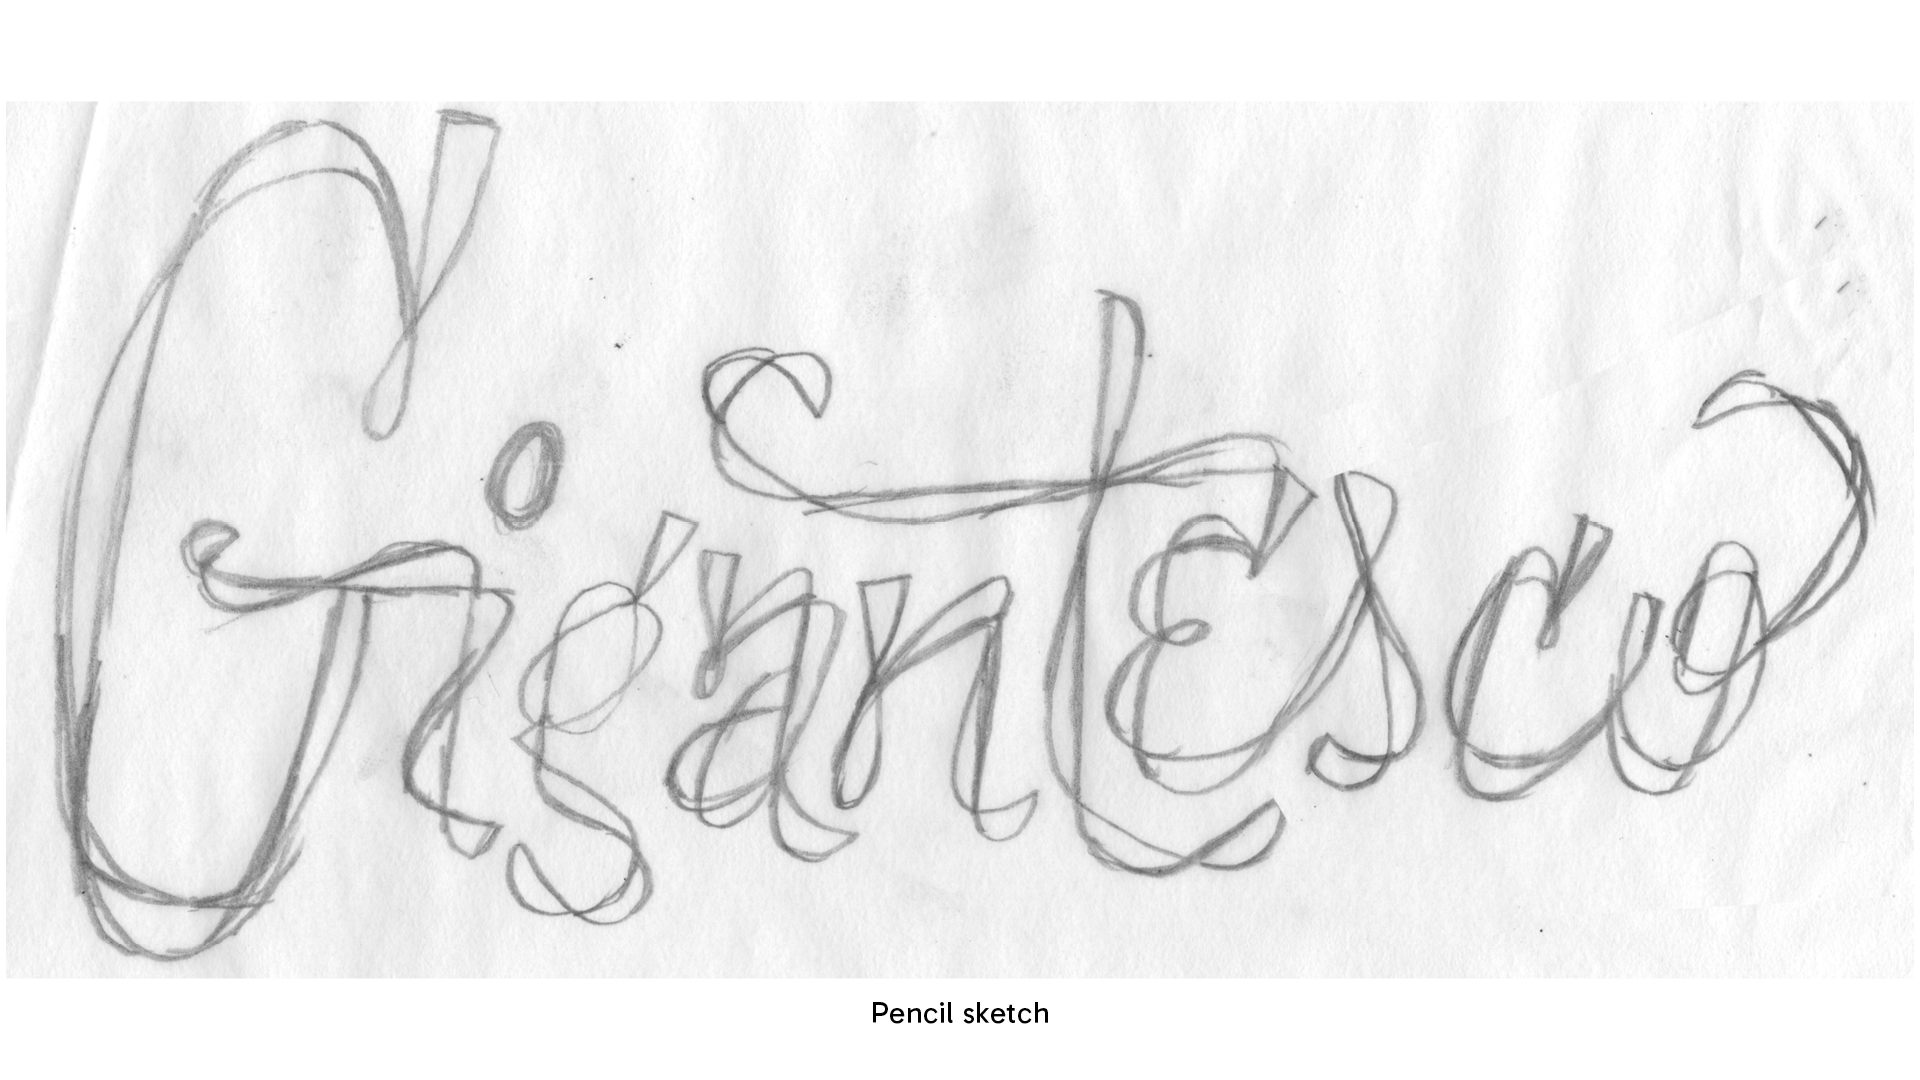 lettering8.png